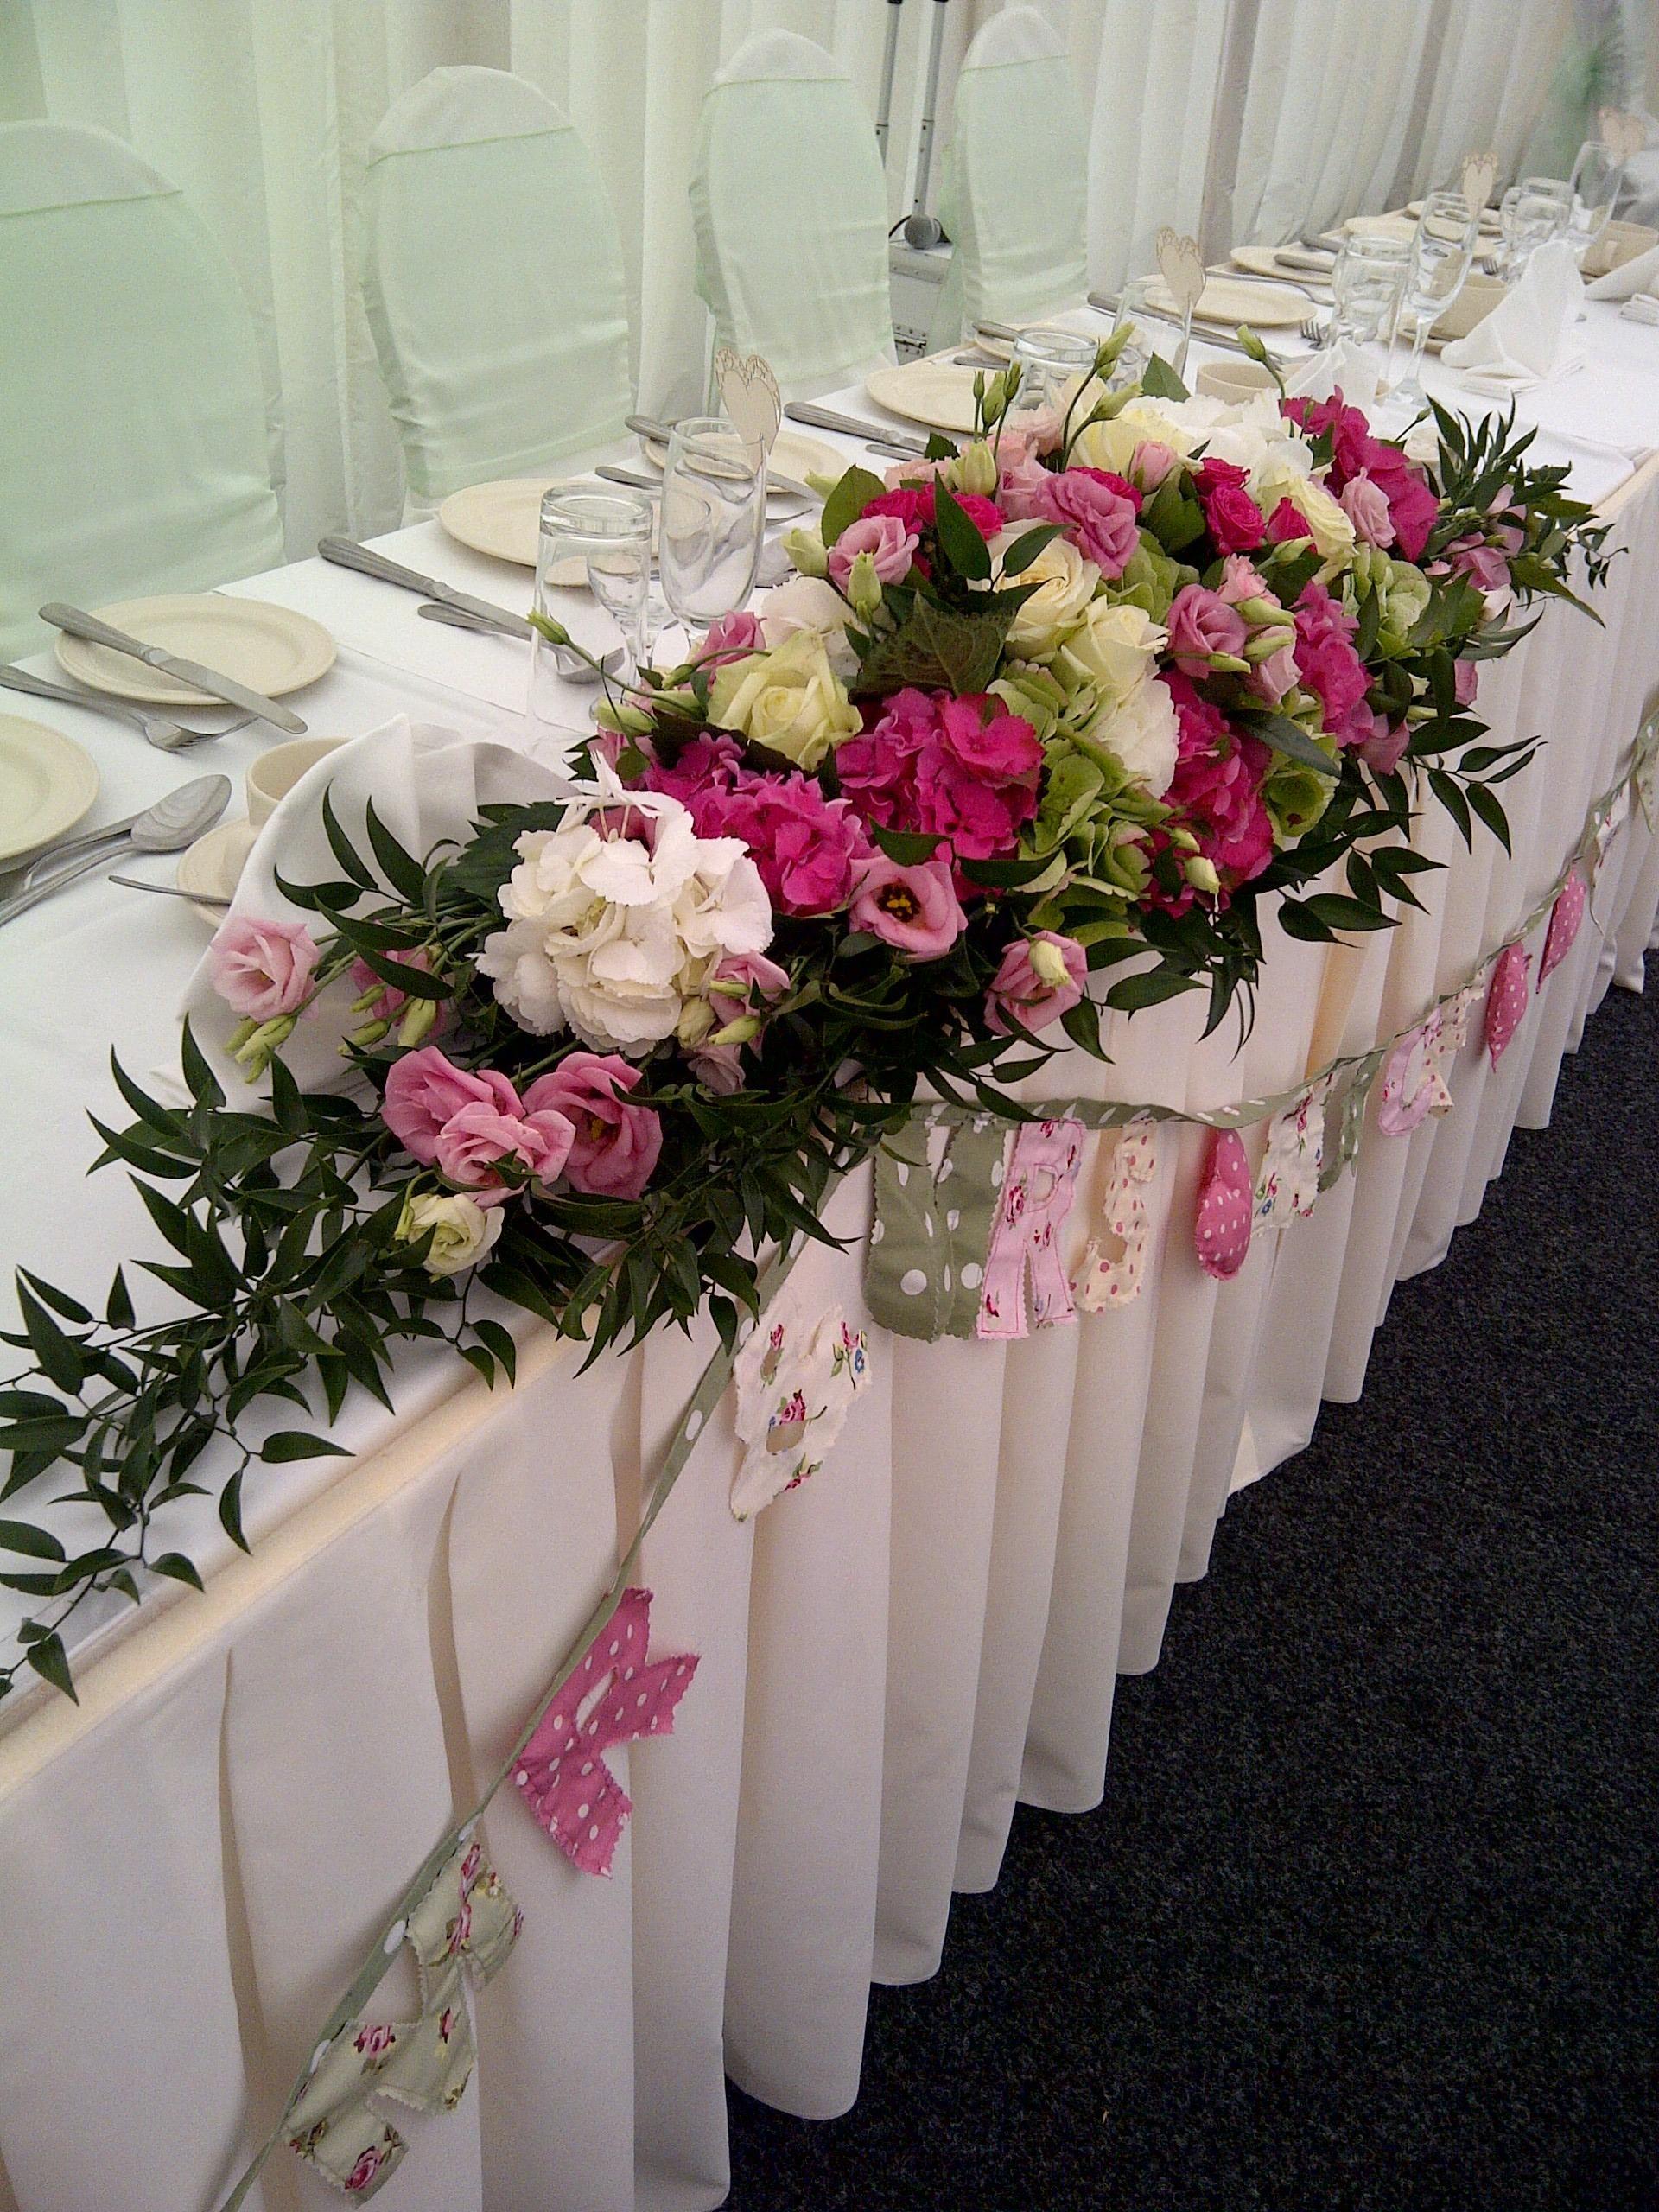 Wedding Table Flower Arrangements Flowers Ideas Hillingdon Top Advice And News